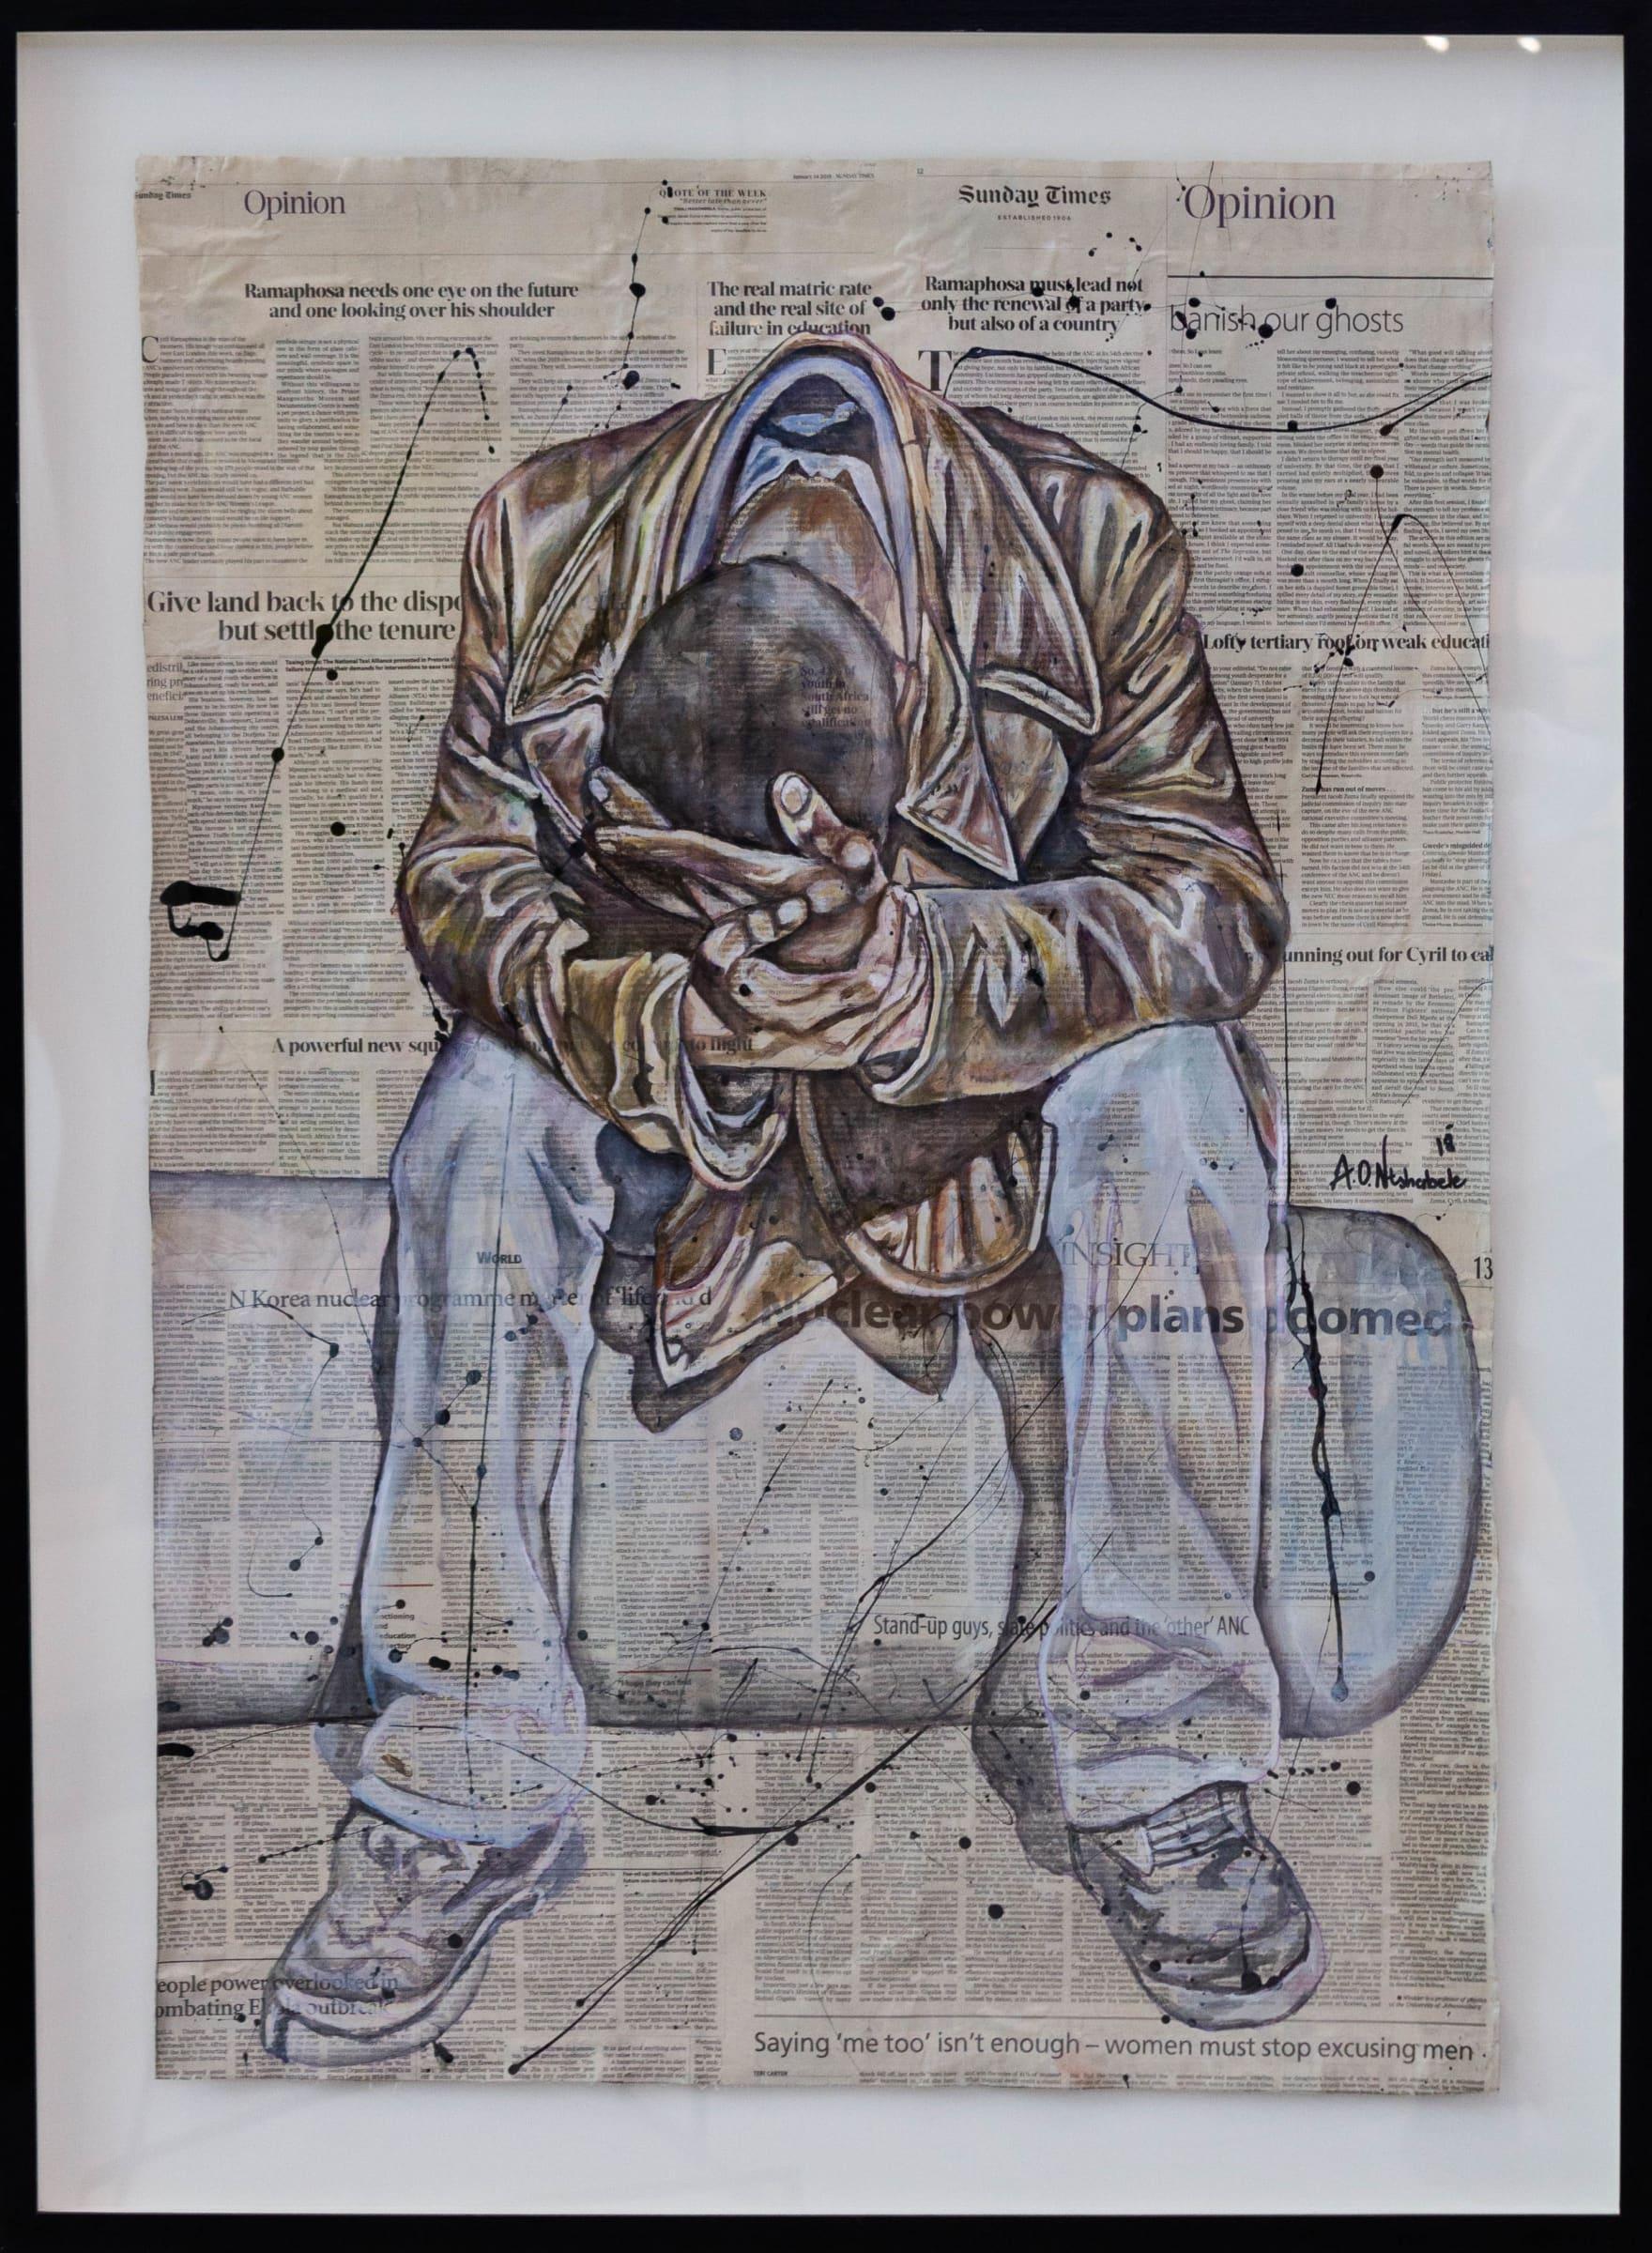 <span class=&#34;link fancybox-details-link&#34;><a href=&#34;/artworks/276-andrew-ntshabele-contemplation-2018/&#34;>View Detail Page</a></span><div class=&#34;artist&#34;><strong>Andrew Ntshabele</strong></div> <div class=&#34;title&#34;><em>Contemplation</em>, 2018</div> <div class=&#34;medium&#34;>Acrylic & Enamel On Newspaper</div> <div class=&#34;dimensions&#34;>99.5cm x 69.6cm (86.6cm x 116.3cm framed)</div><div class=&#34;price&#34;>R11,200.00</div>